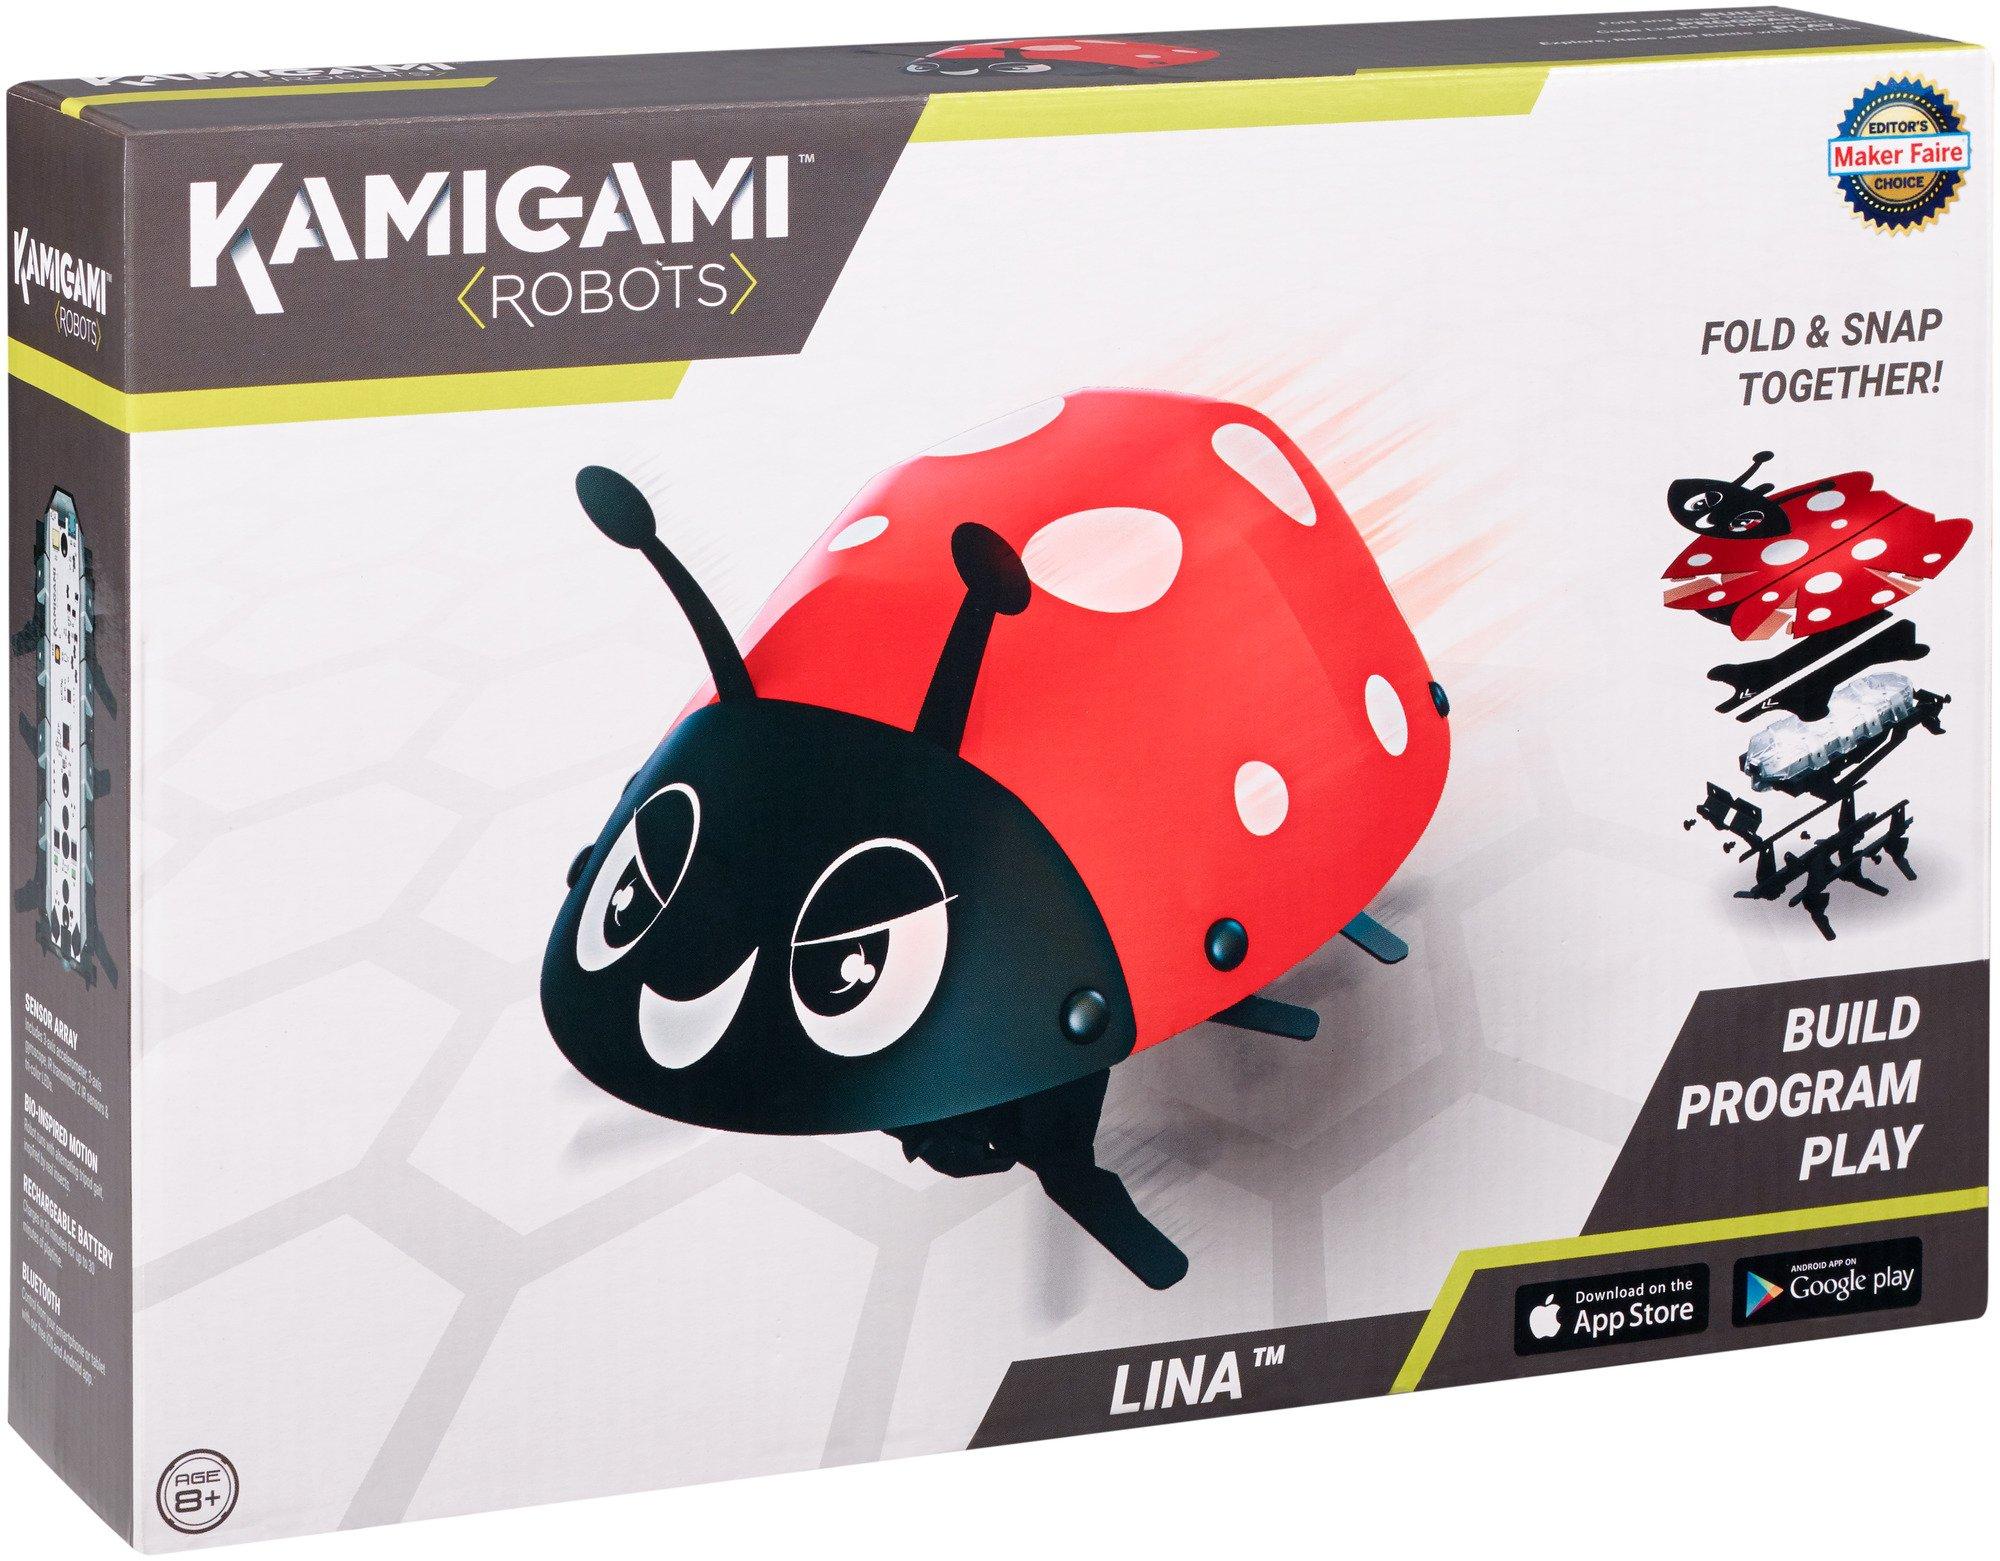 Kamigami Lina Robot by Mattel (Image #12)